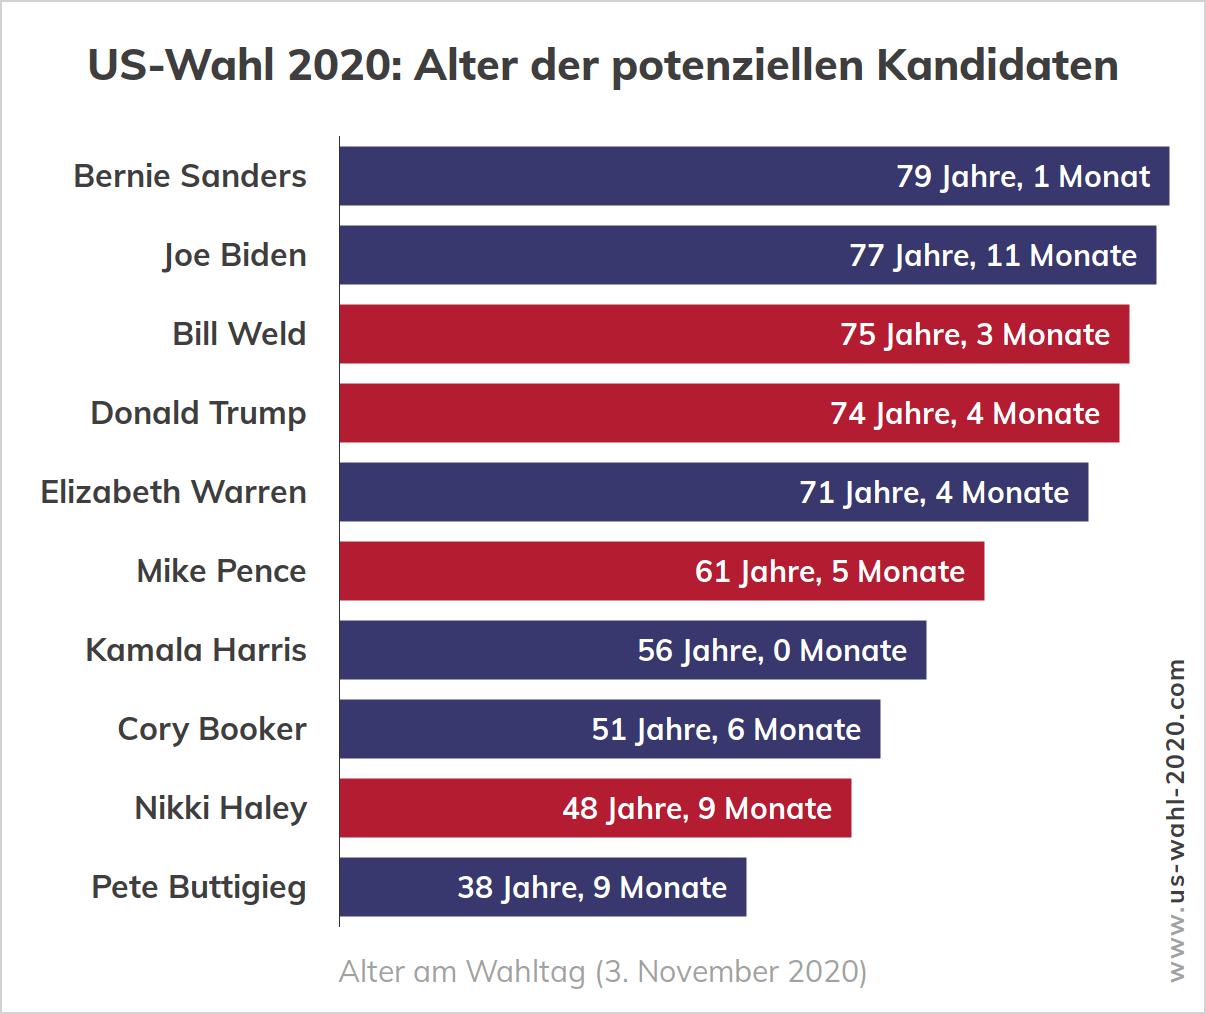 Wahl Usa 2020